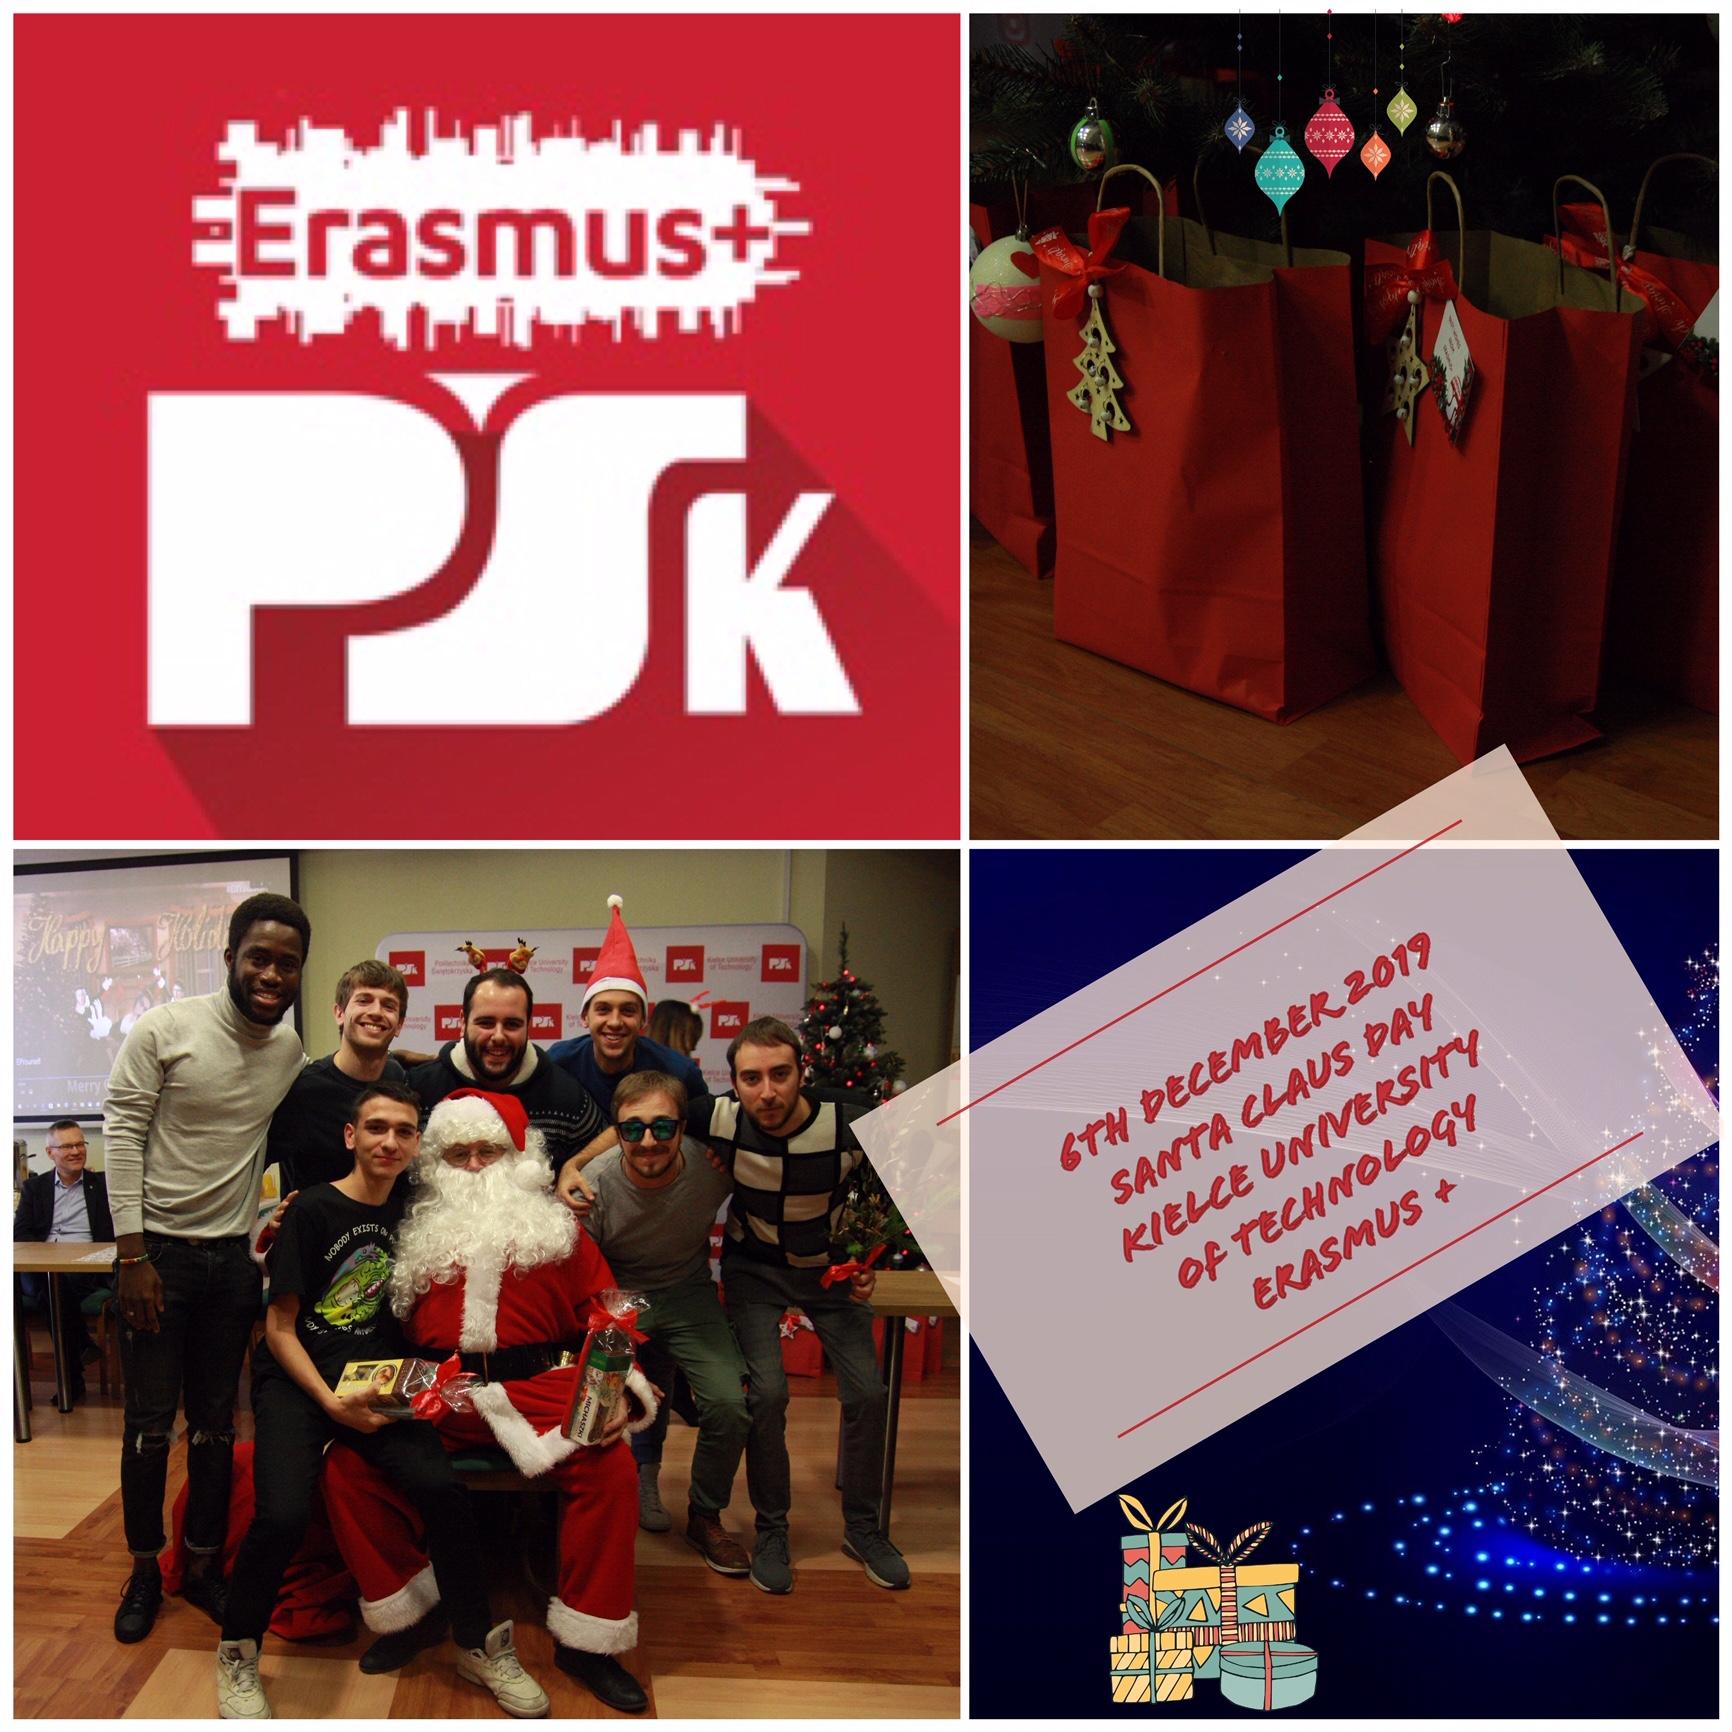 Santa Claus Day at Kielce University of Technology